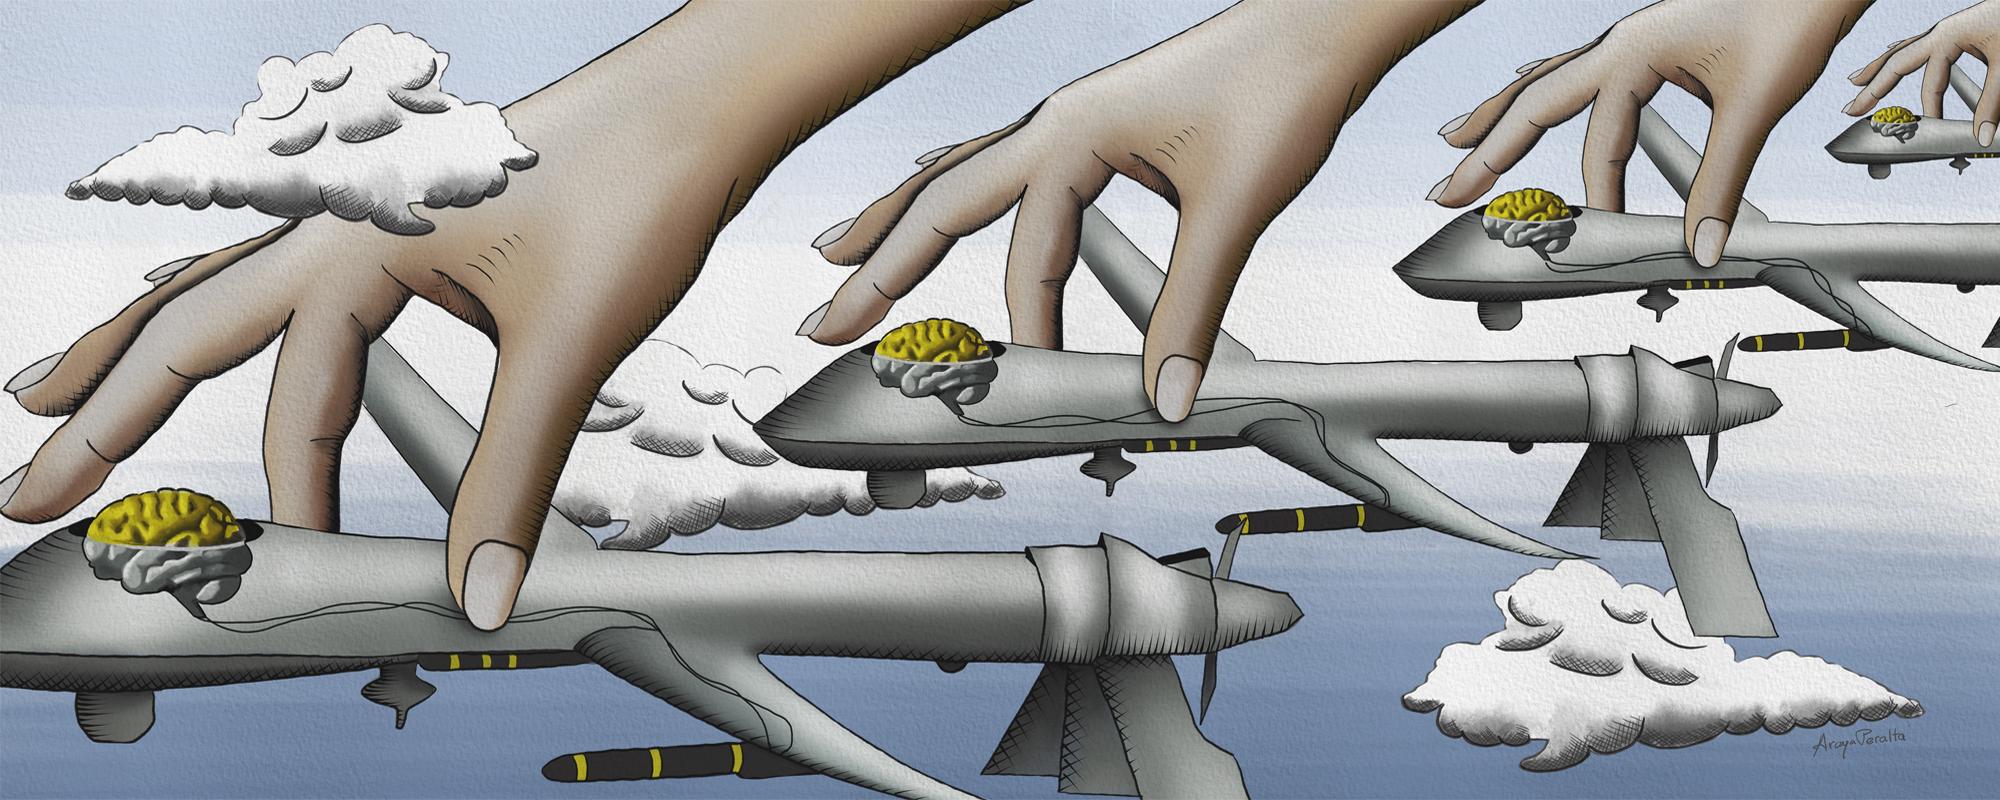 Killer_robots_armes_autònomes_Toby_Walsh_revista_IDEES